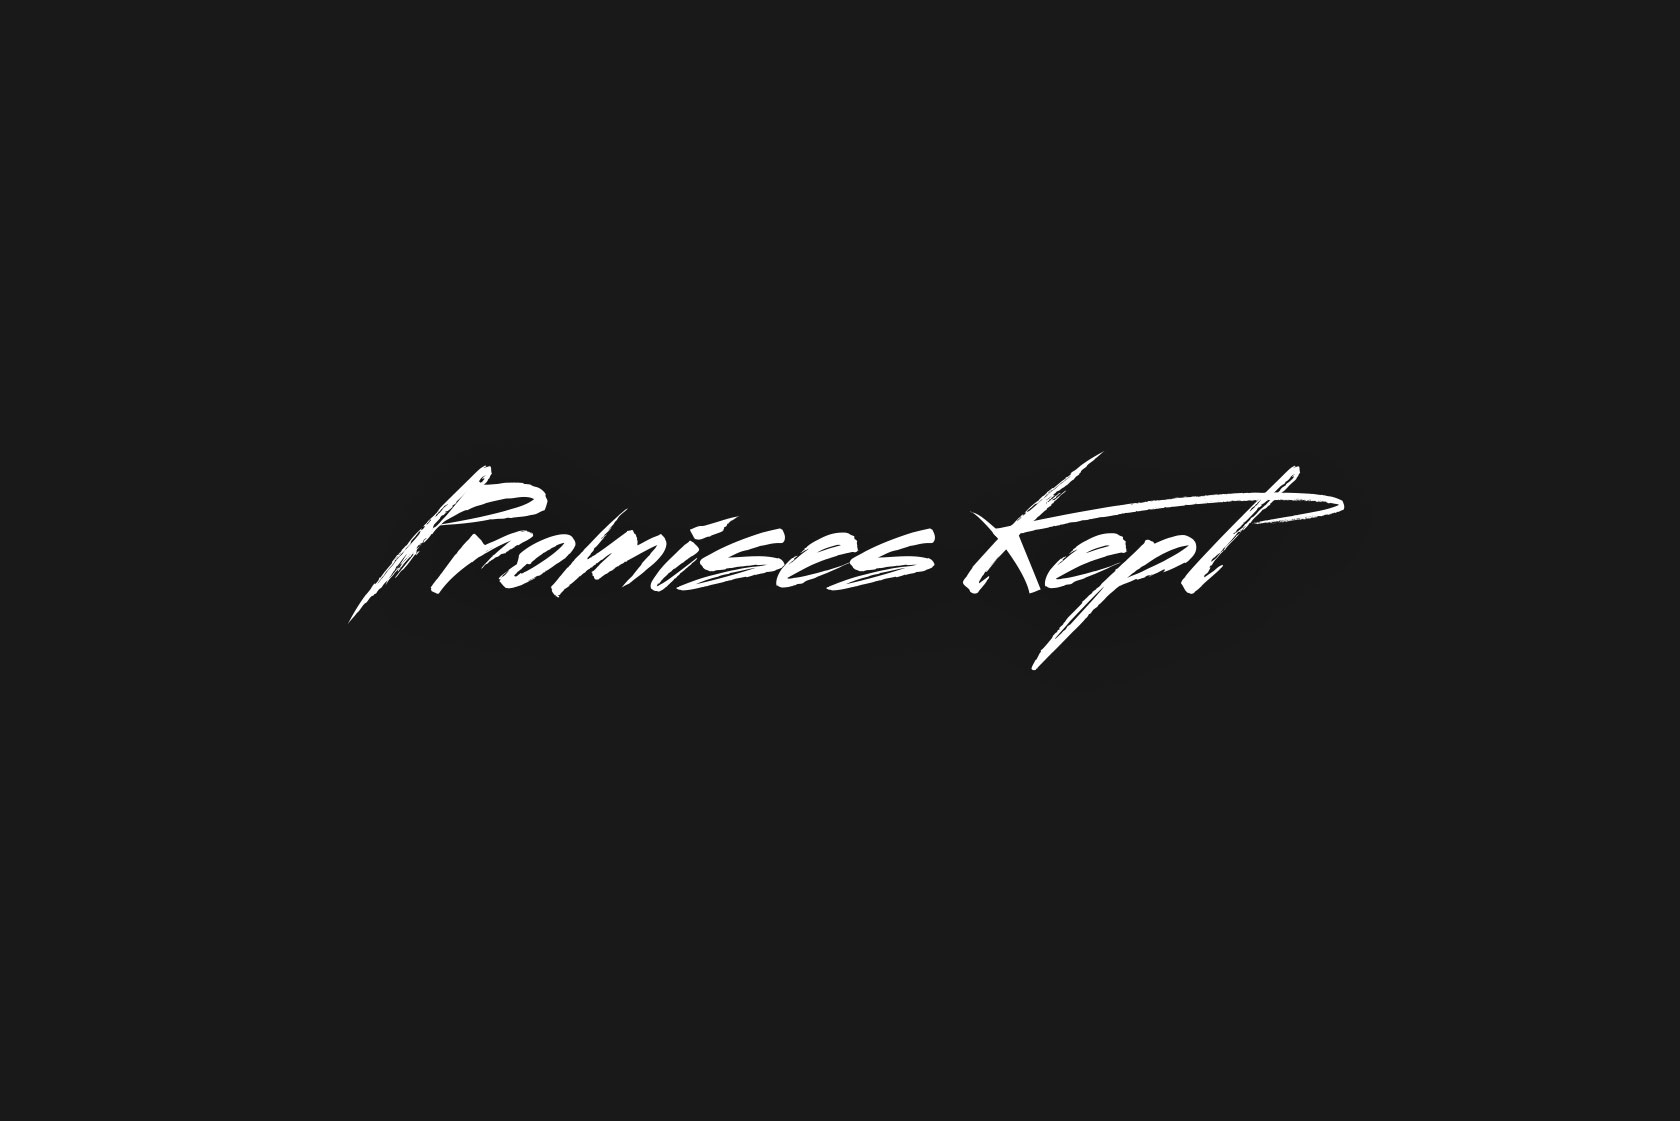 Logo von Promises Kept